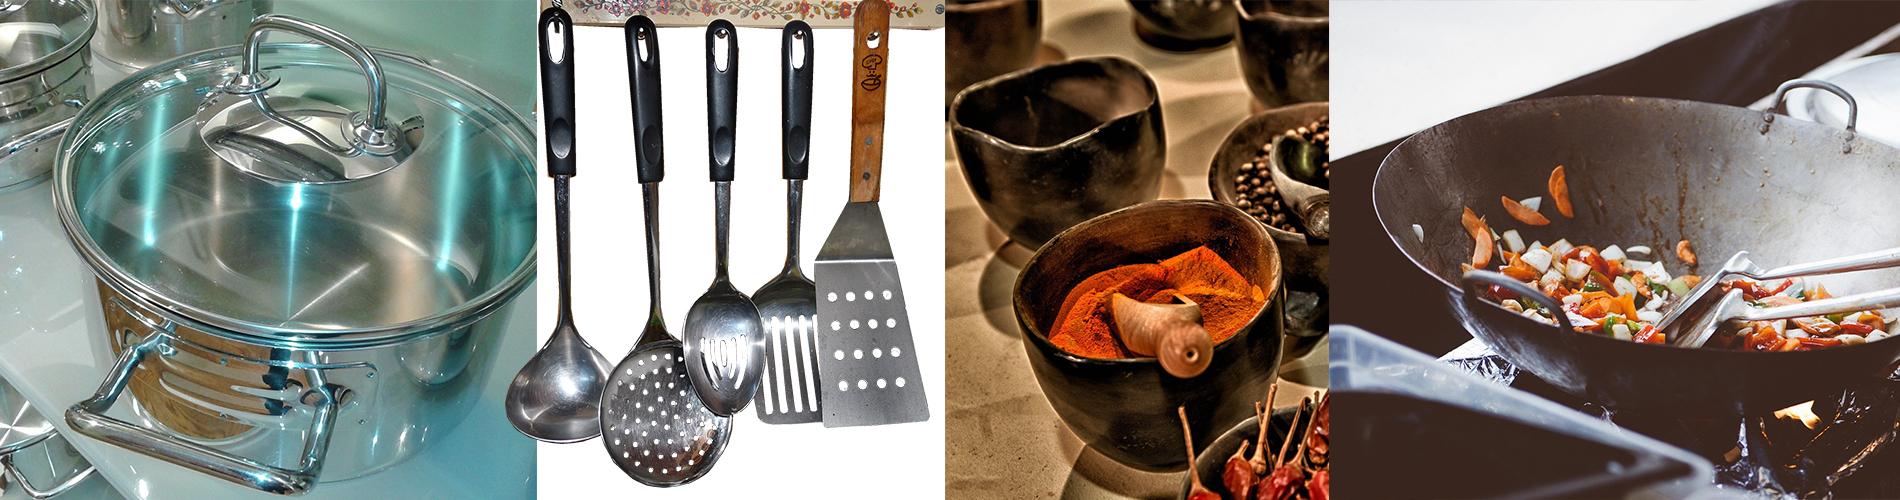 utensilios de cocina para arroz con pollo